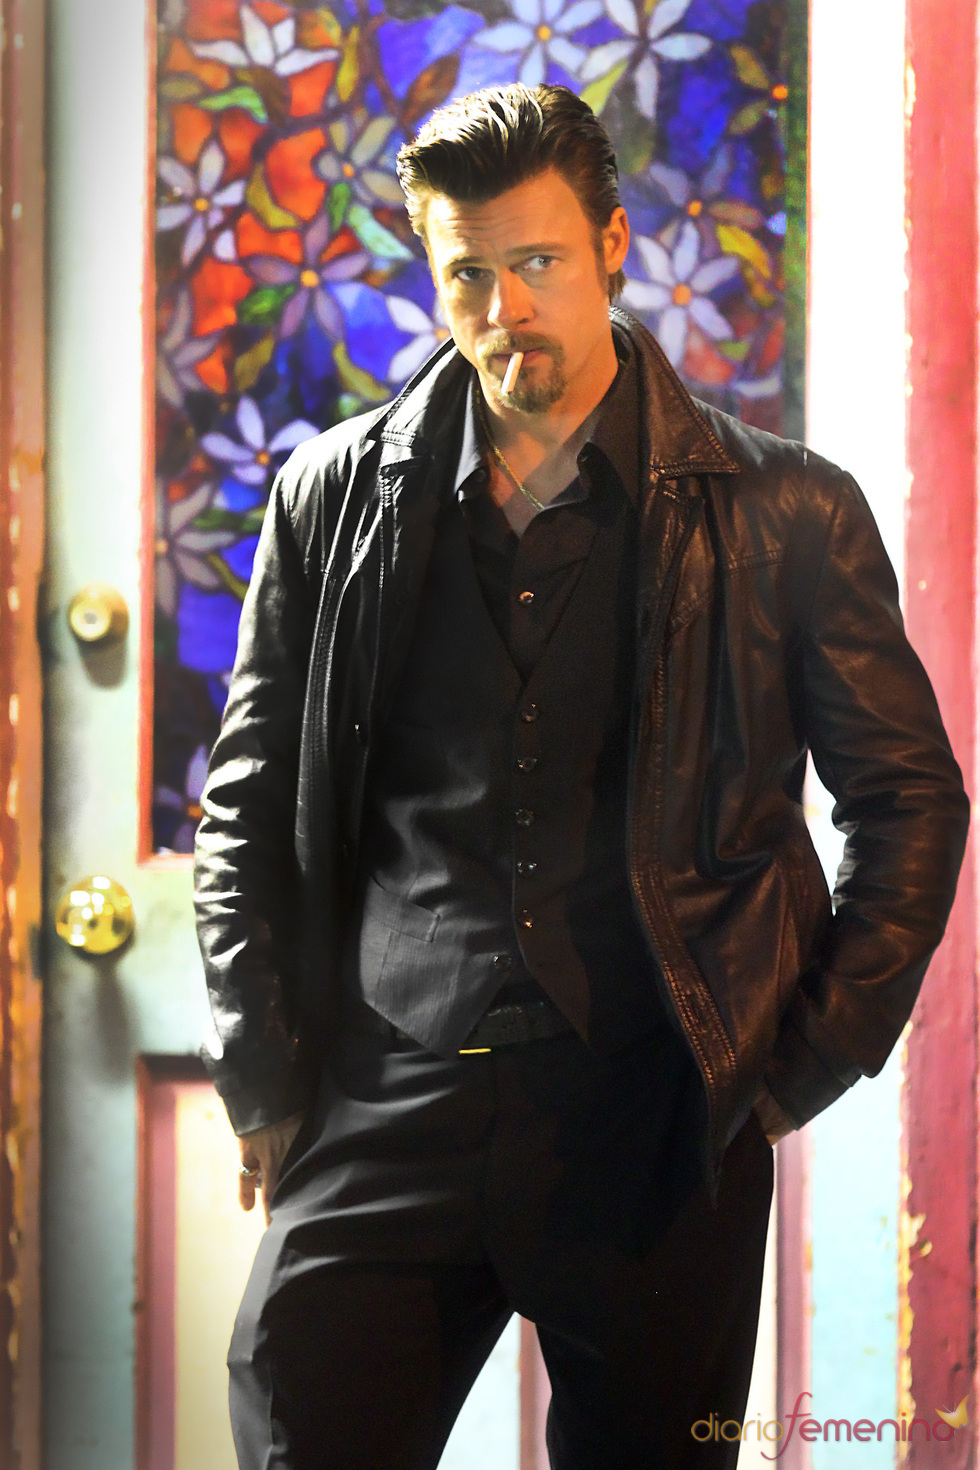 Brad Pitt, un gánster en 'Cogan's Trade'